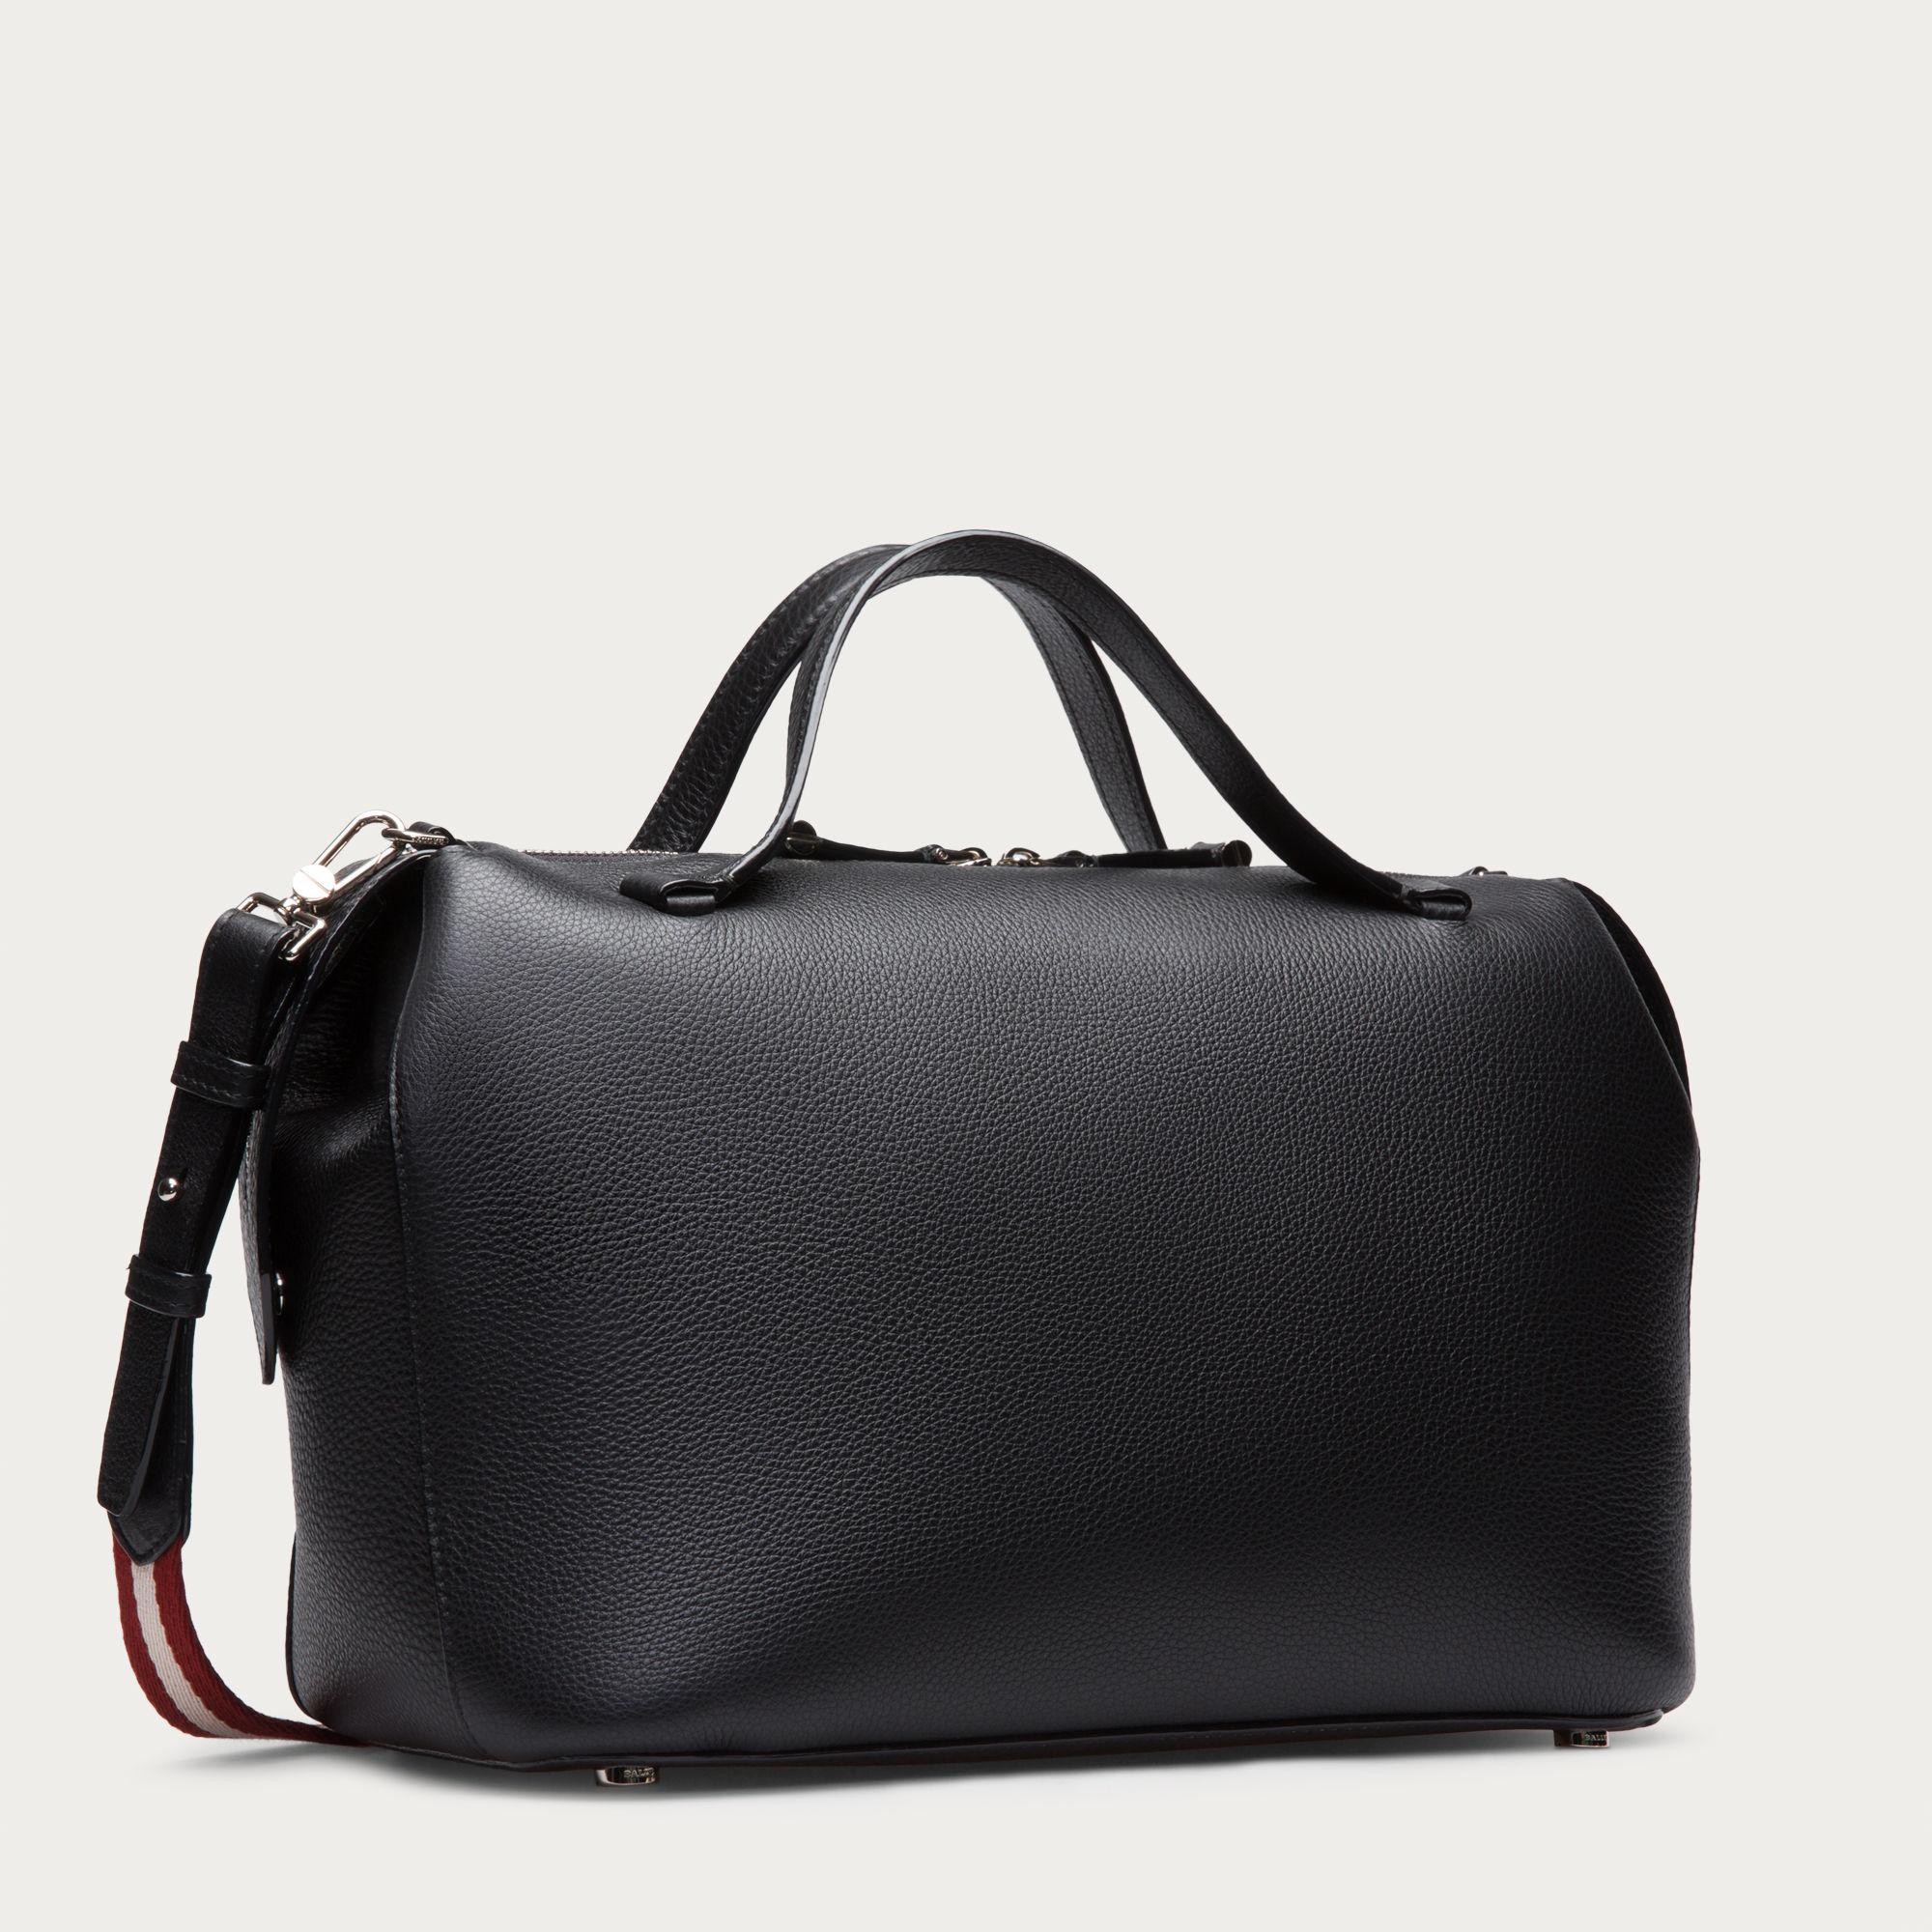 Innovative Women39s Red Tote Bags Handbag Woman